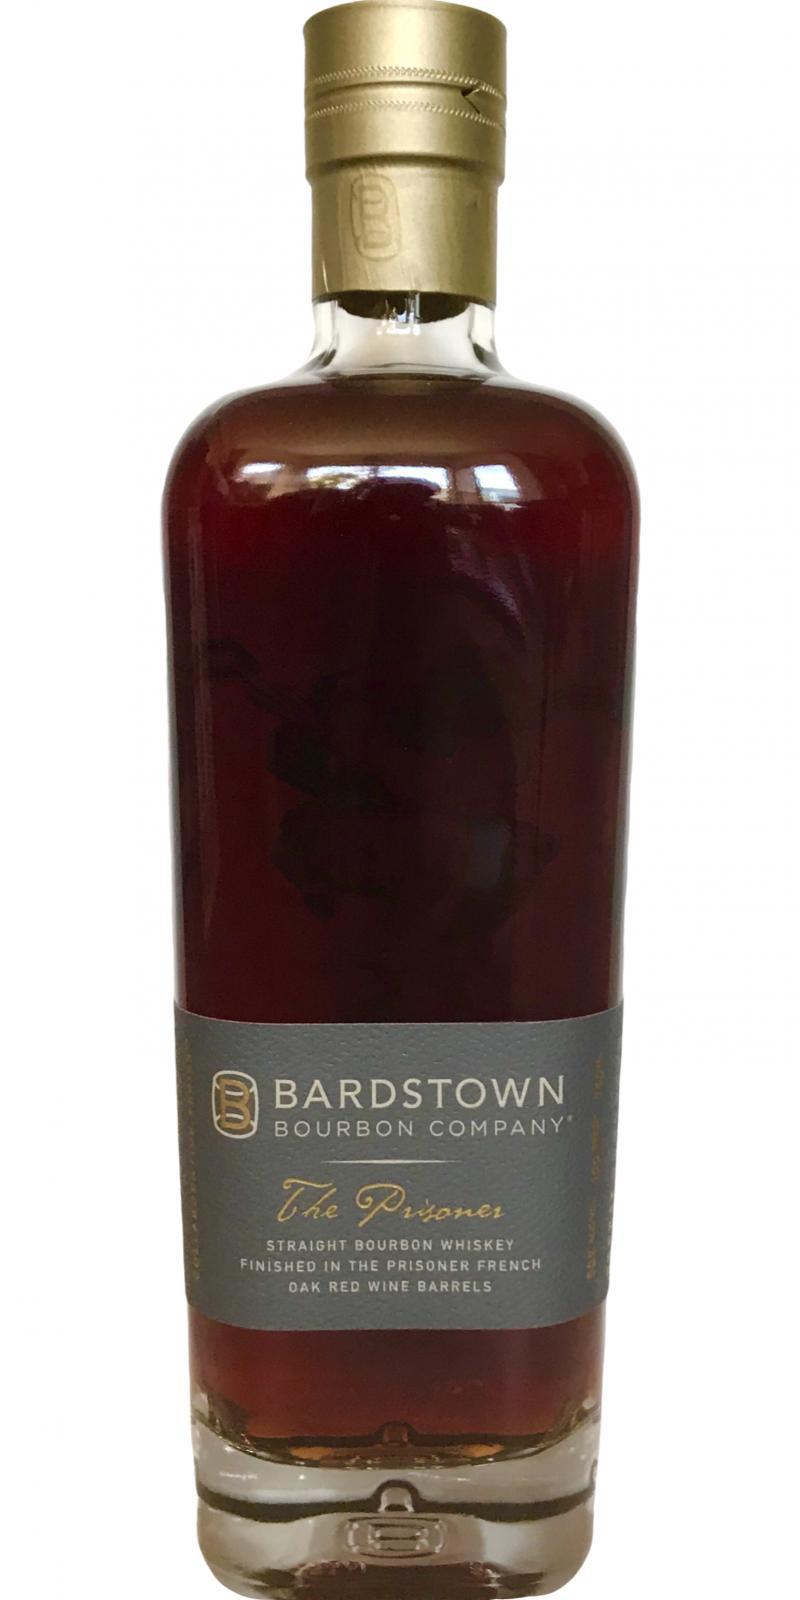 Bardstown Bourbon Company The Prisoner